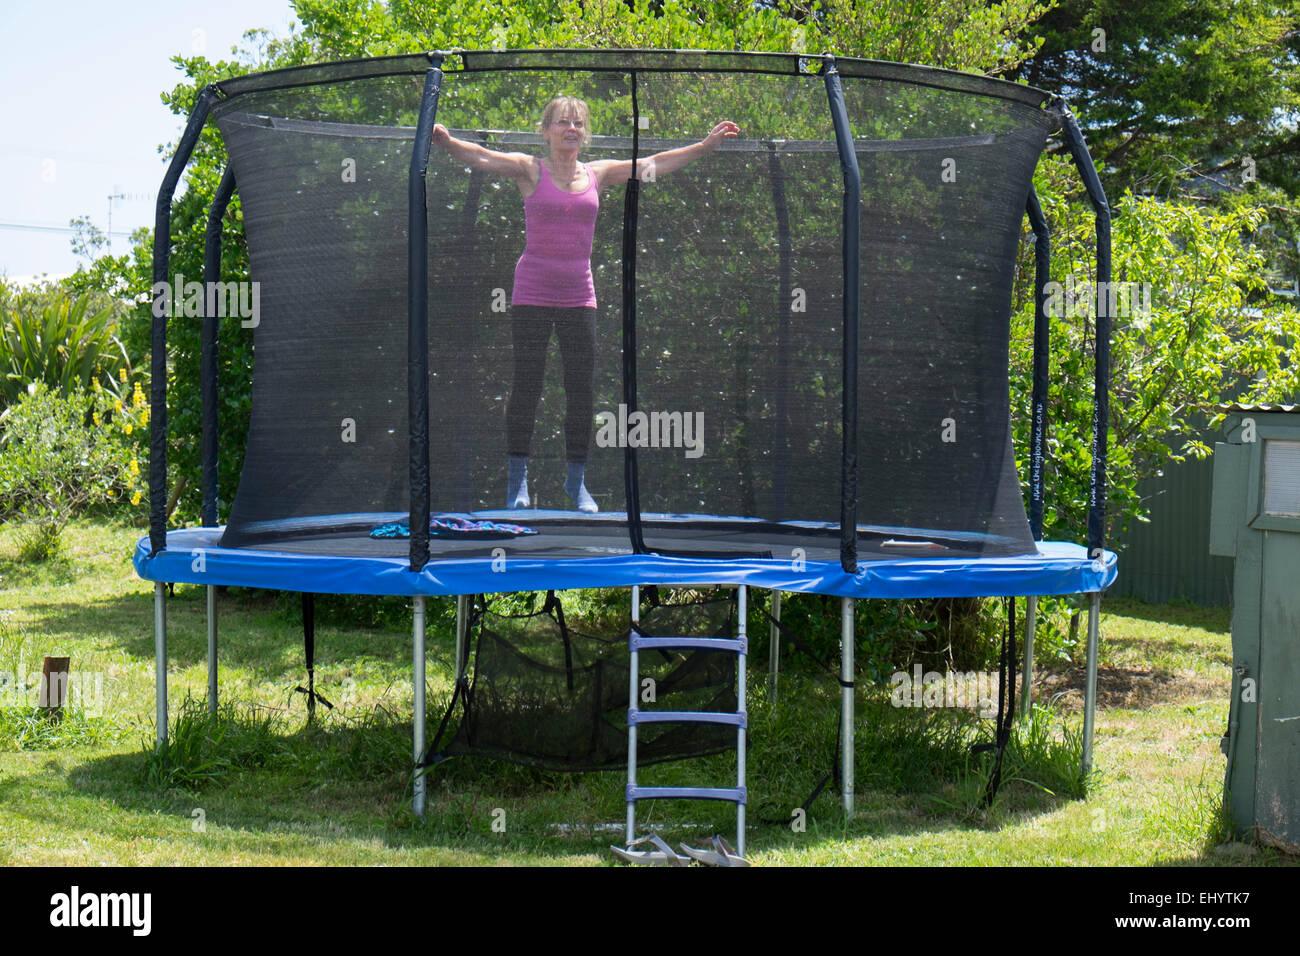 Elderly woman bouncing on trampoline in garden - Stock Image